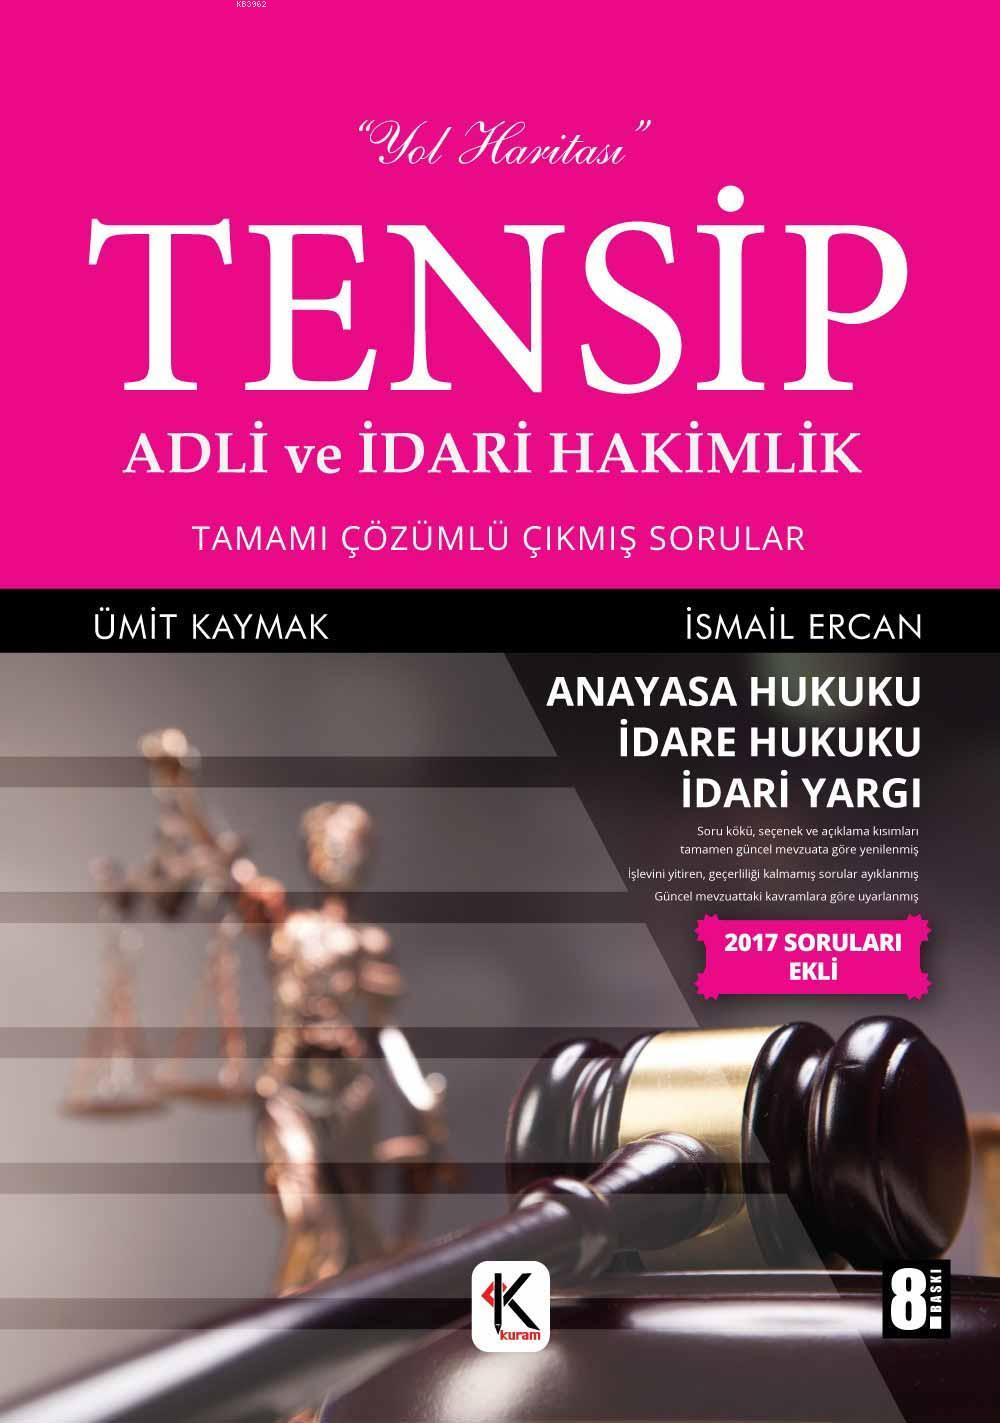 Tensip Adli ve İdari Hakimlik; Sorular-Anayasa Hukuku-İdare Hukuku-İdari Yargı